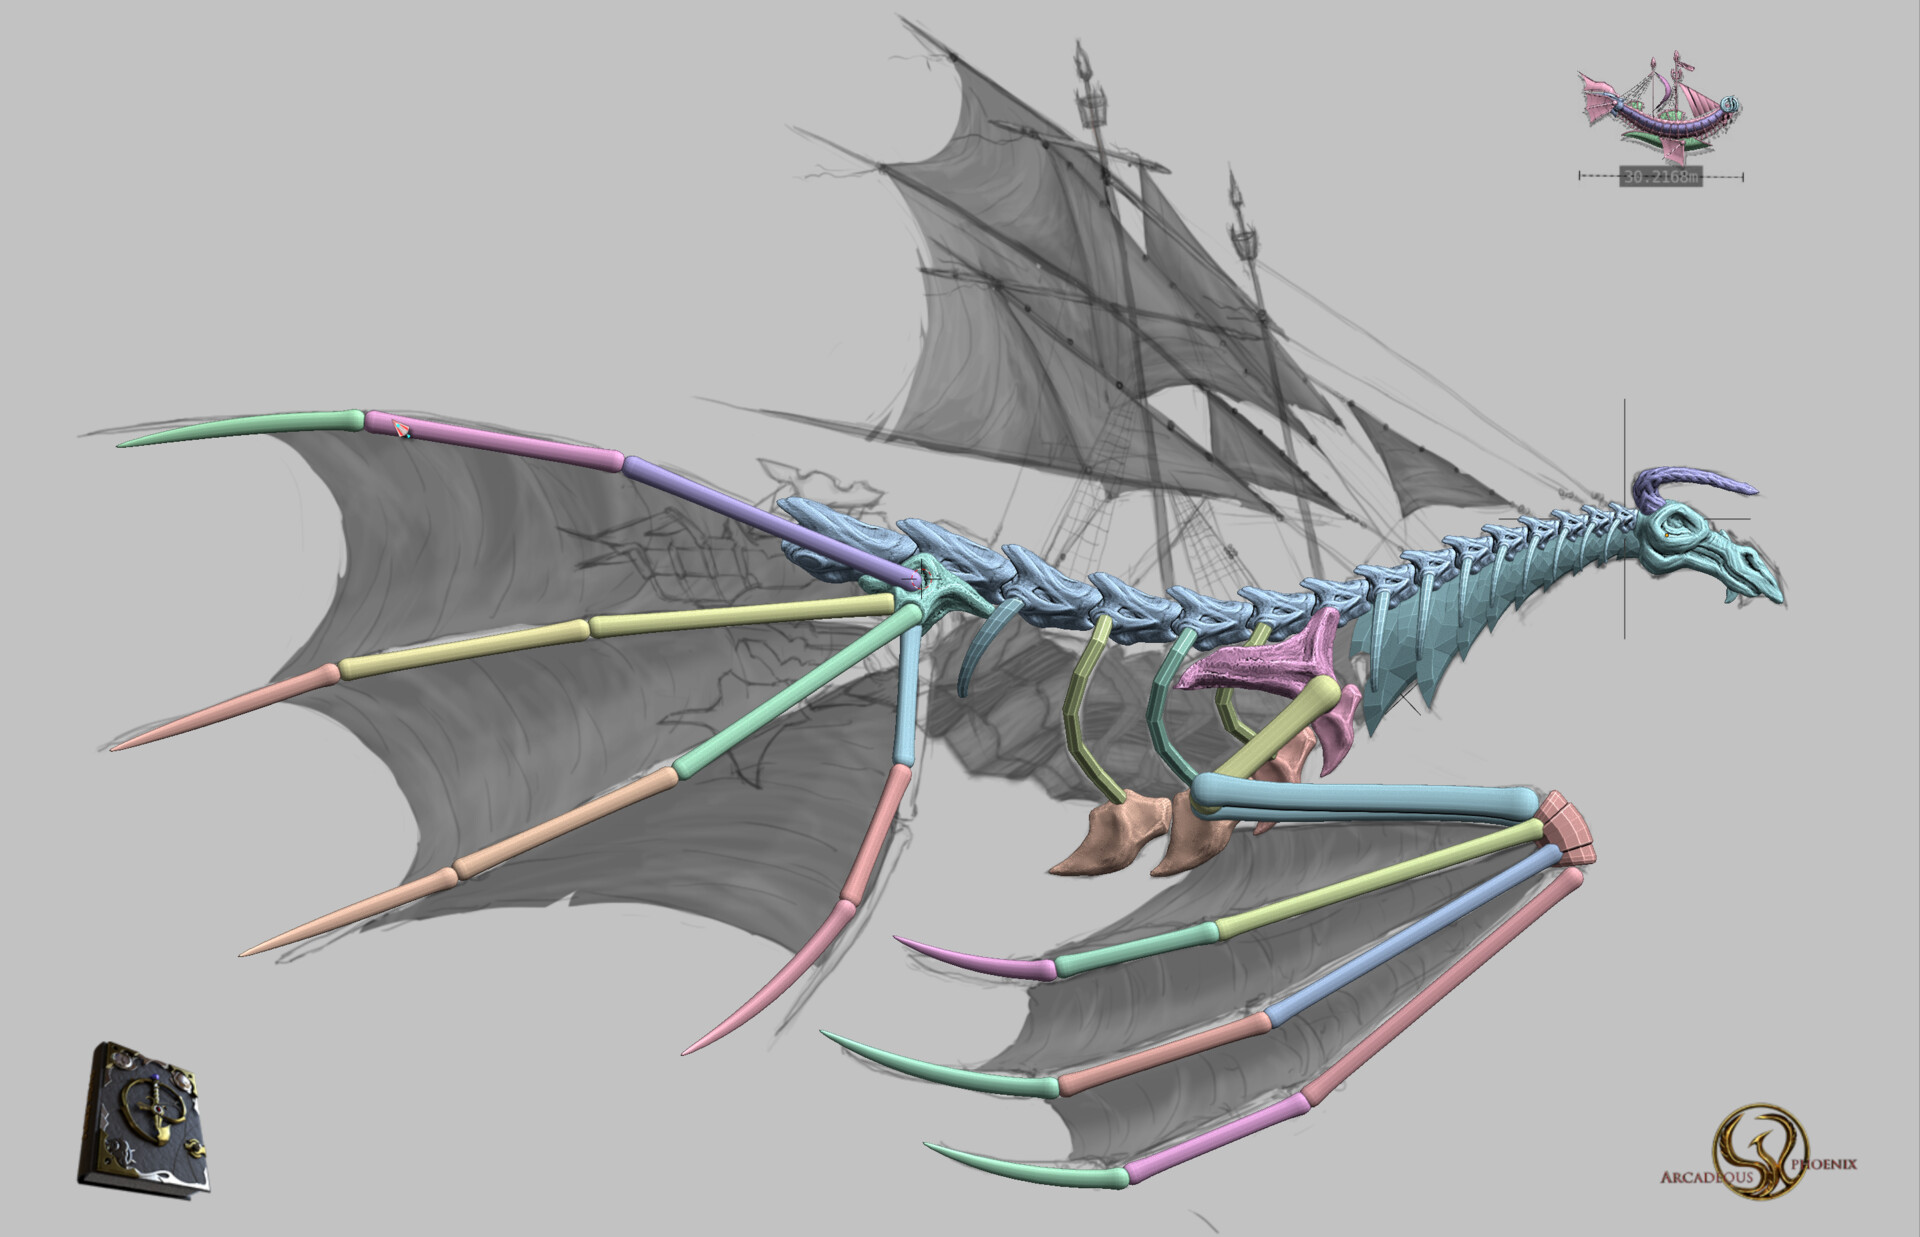 Arcadeous phoenix ww1